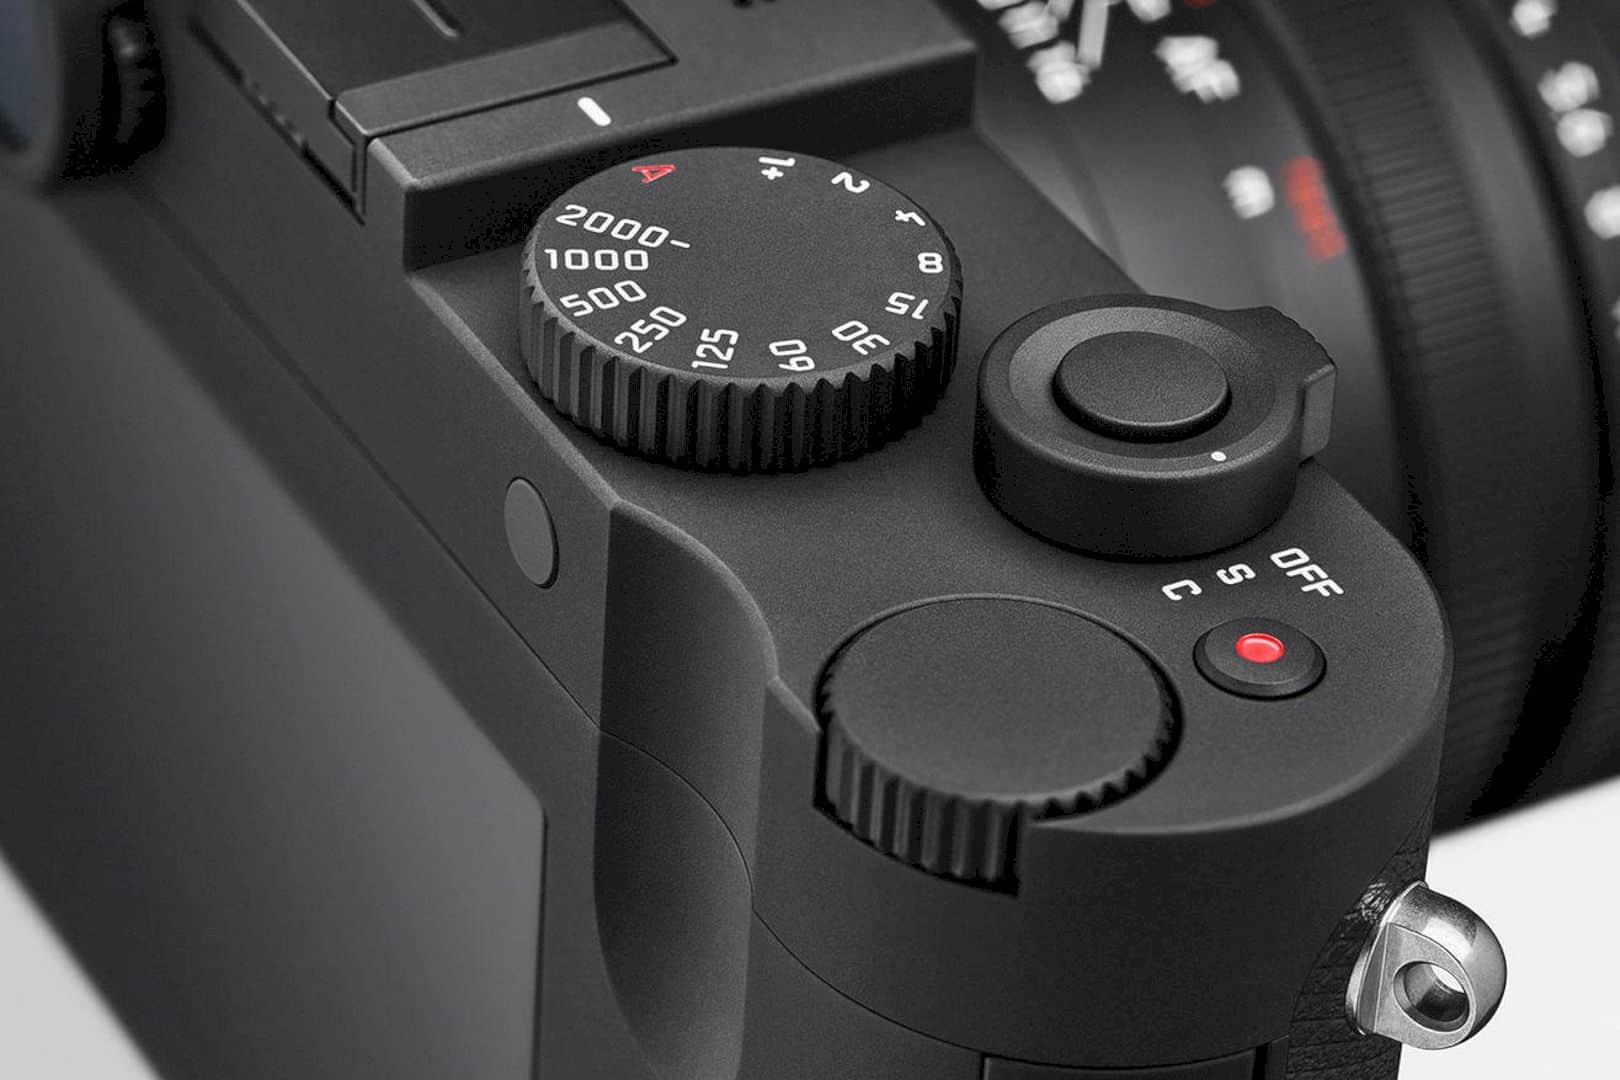 Leica Q P 3